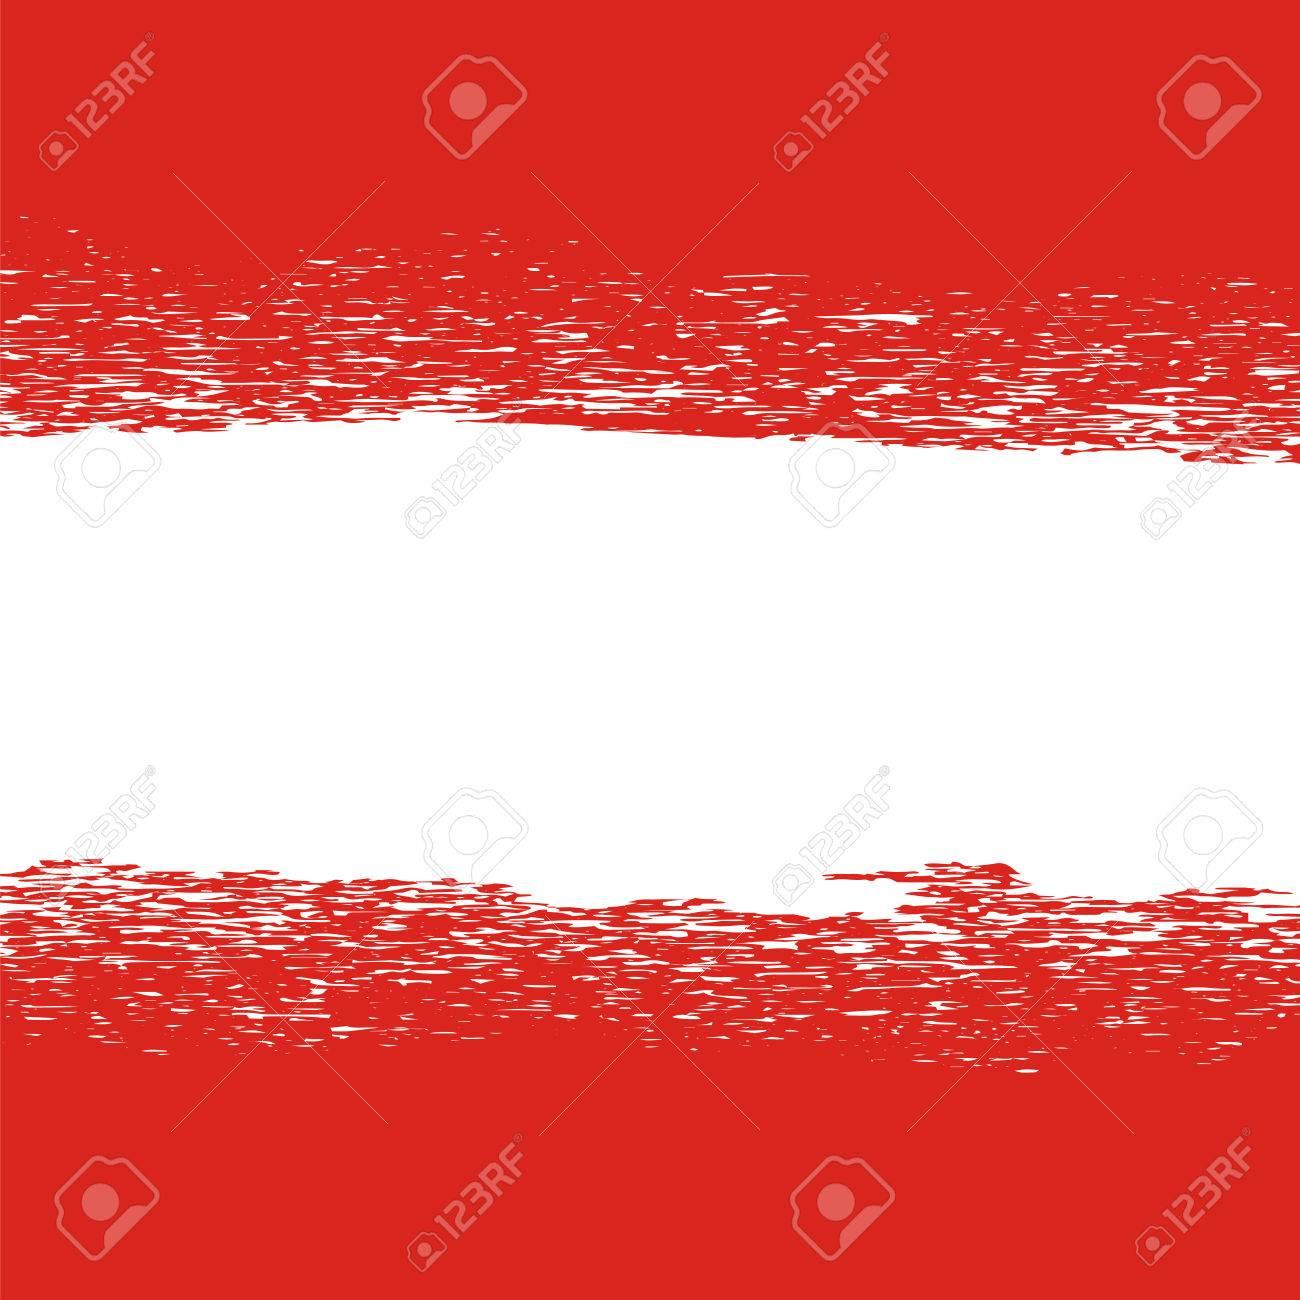 flag of austria flag pattern grunge austrian flag royalty free